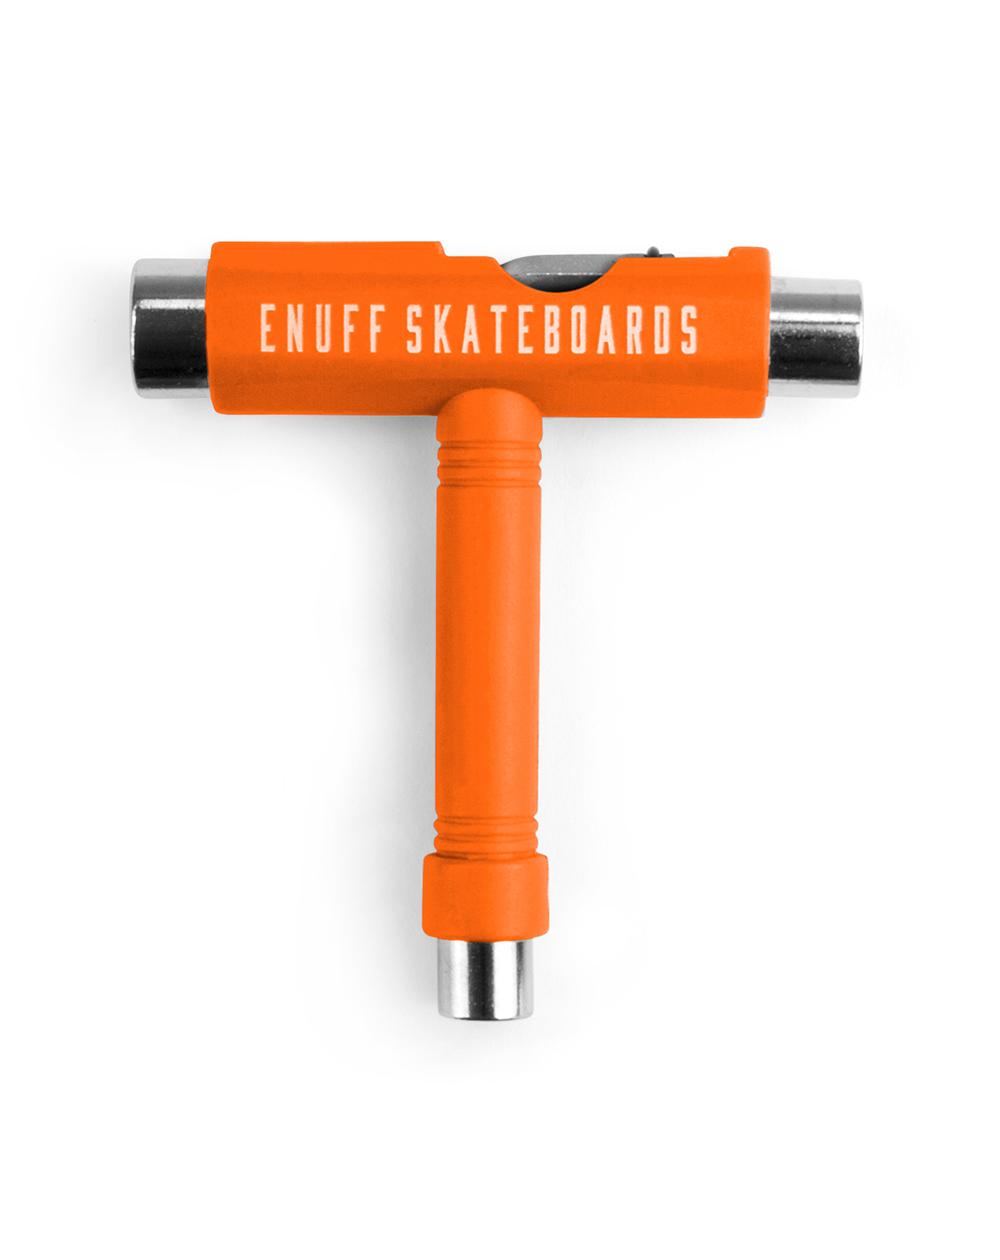 Enuff Chiave Multiuso Skateboard Essential Tool Orange